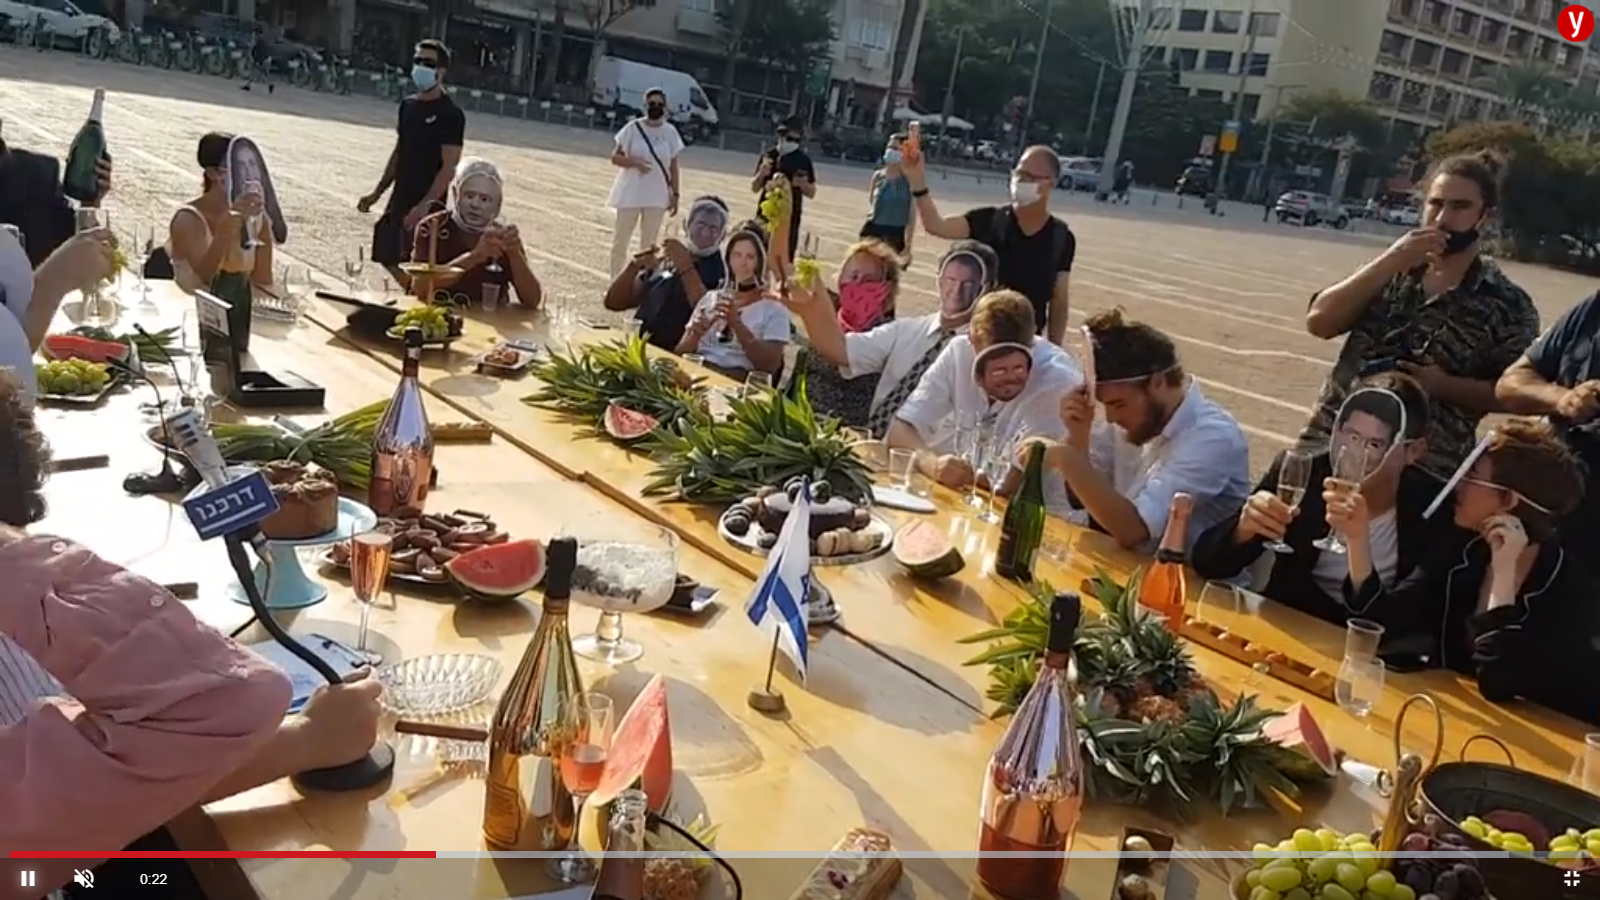 TLV Activists Criticize Netanyahu's Gov't in Rabin Square: Festive of Ministers Drinking Champagne / Screenshot